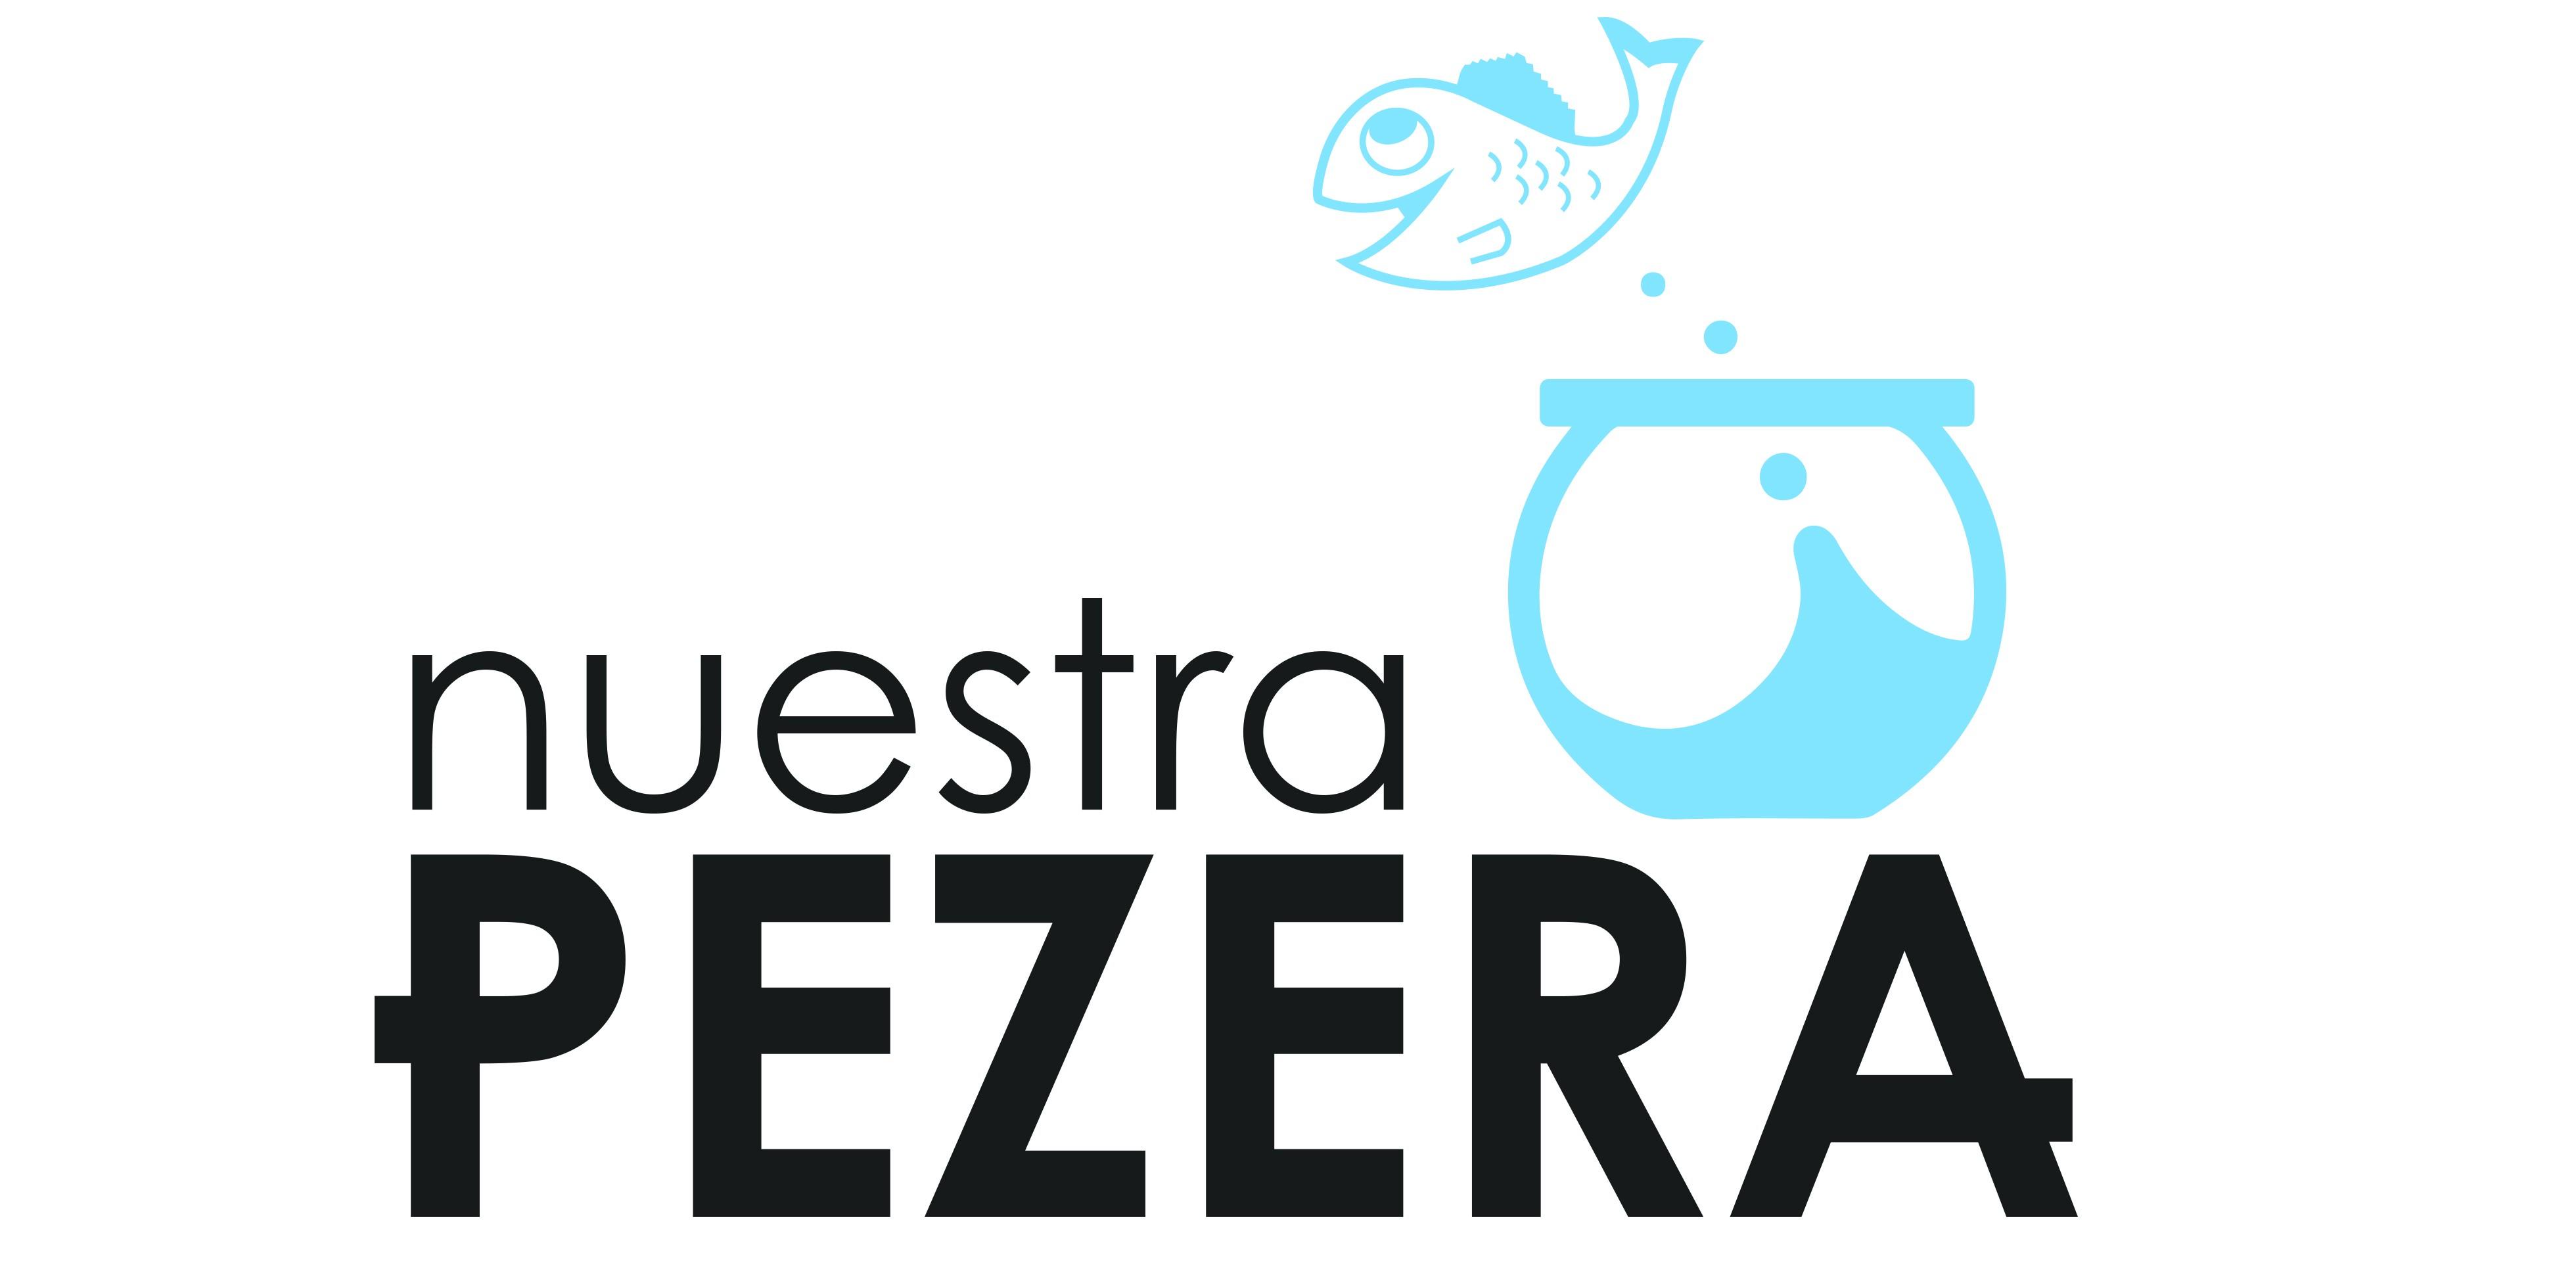 NUESTRA PEZERA